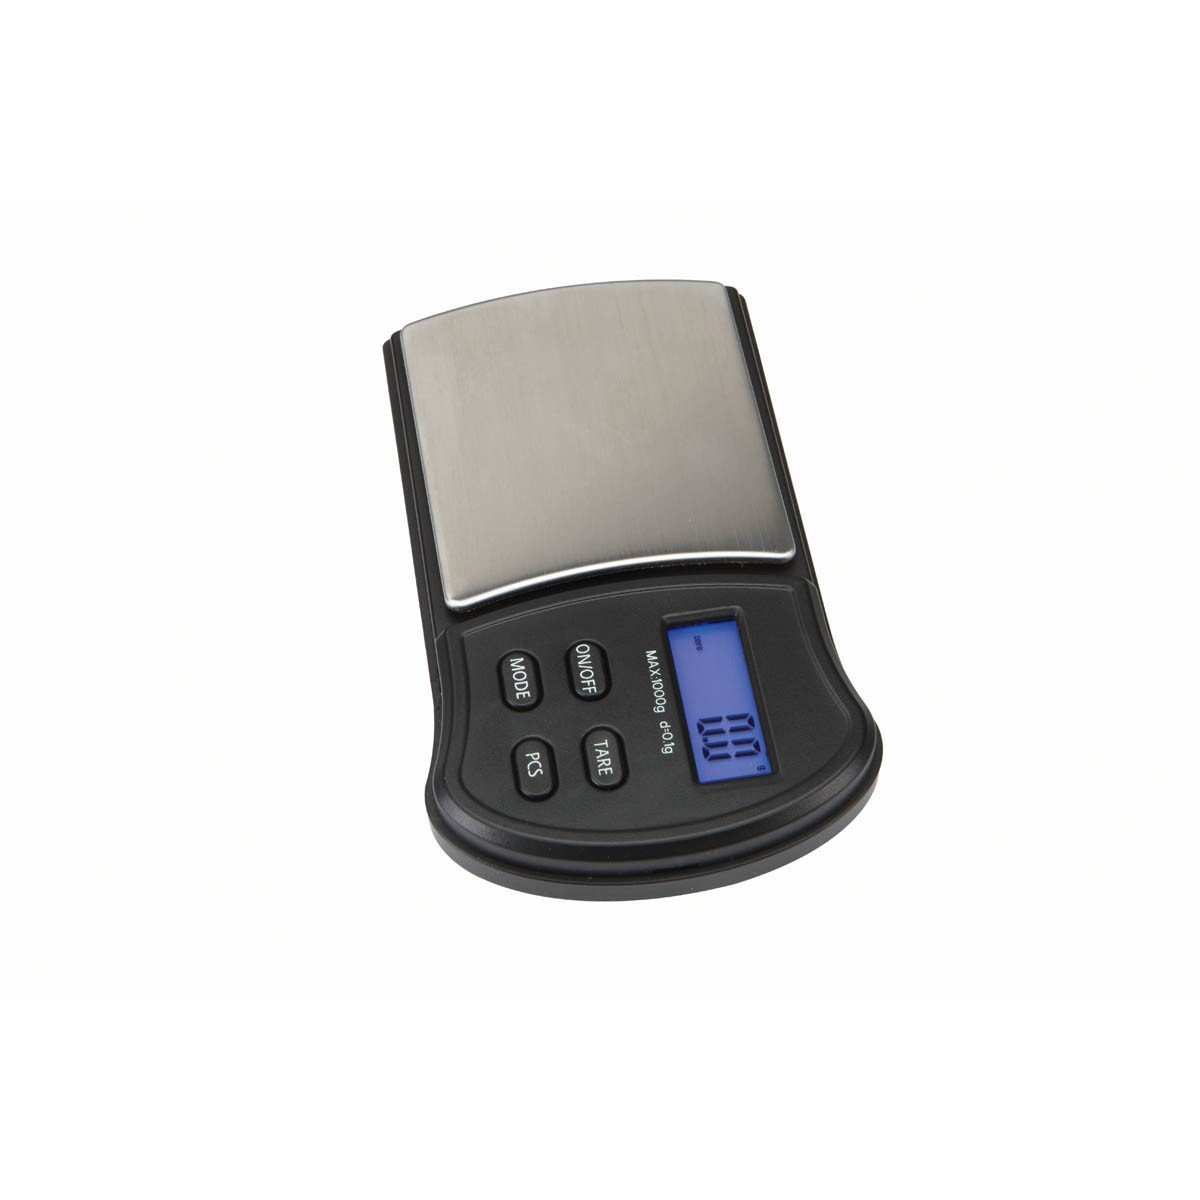 1000 gram Digital Scale -USATM by Cen-Tech